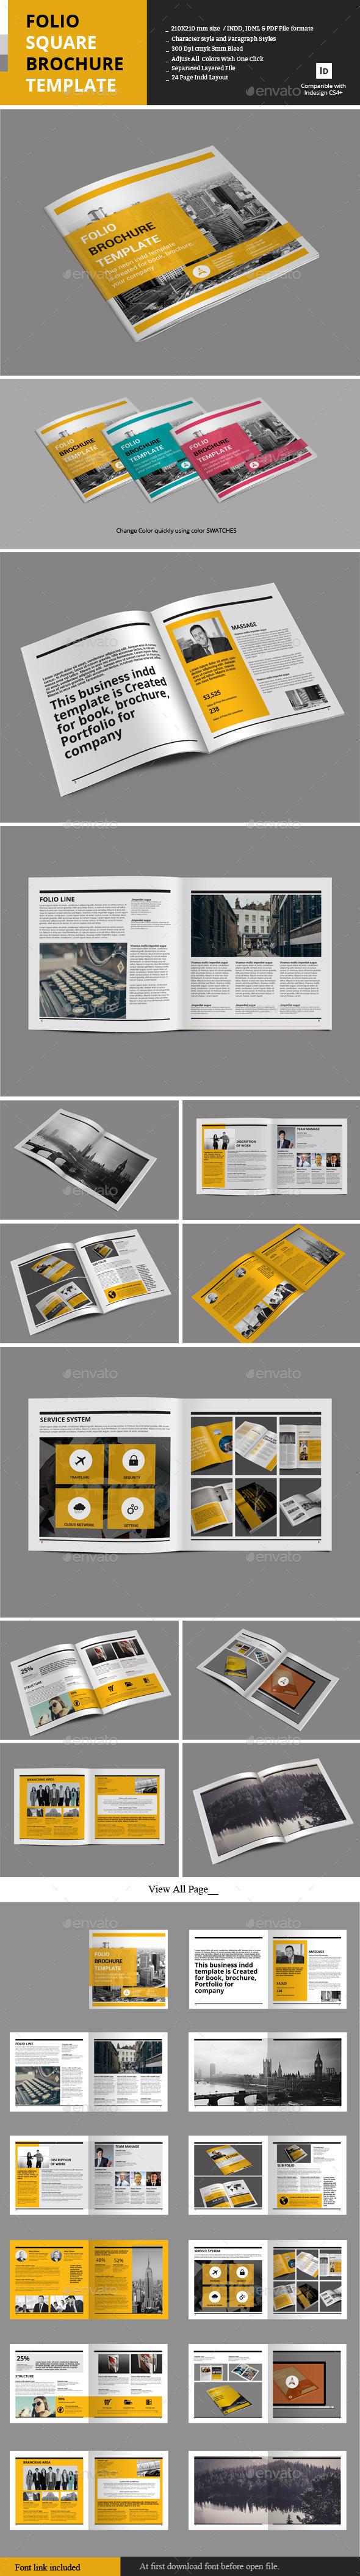 Folio Square Brochure Template - Portfolio Brochures